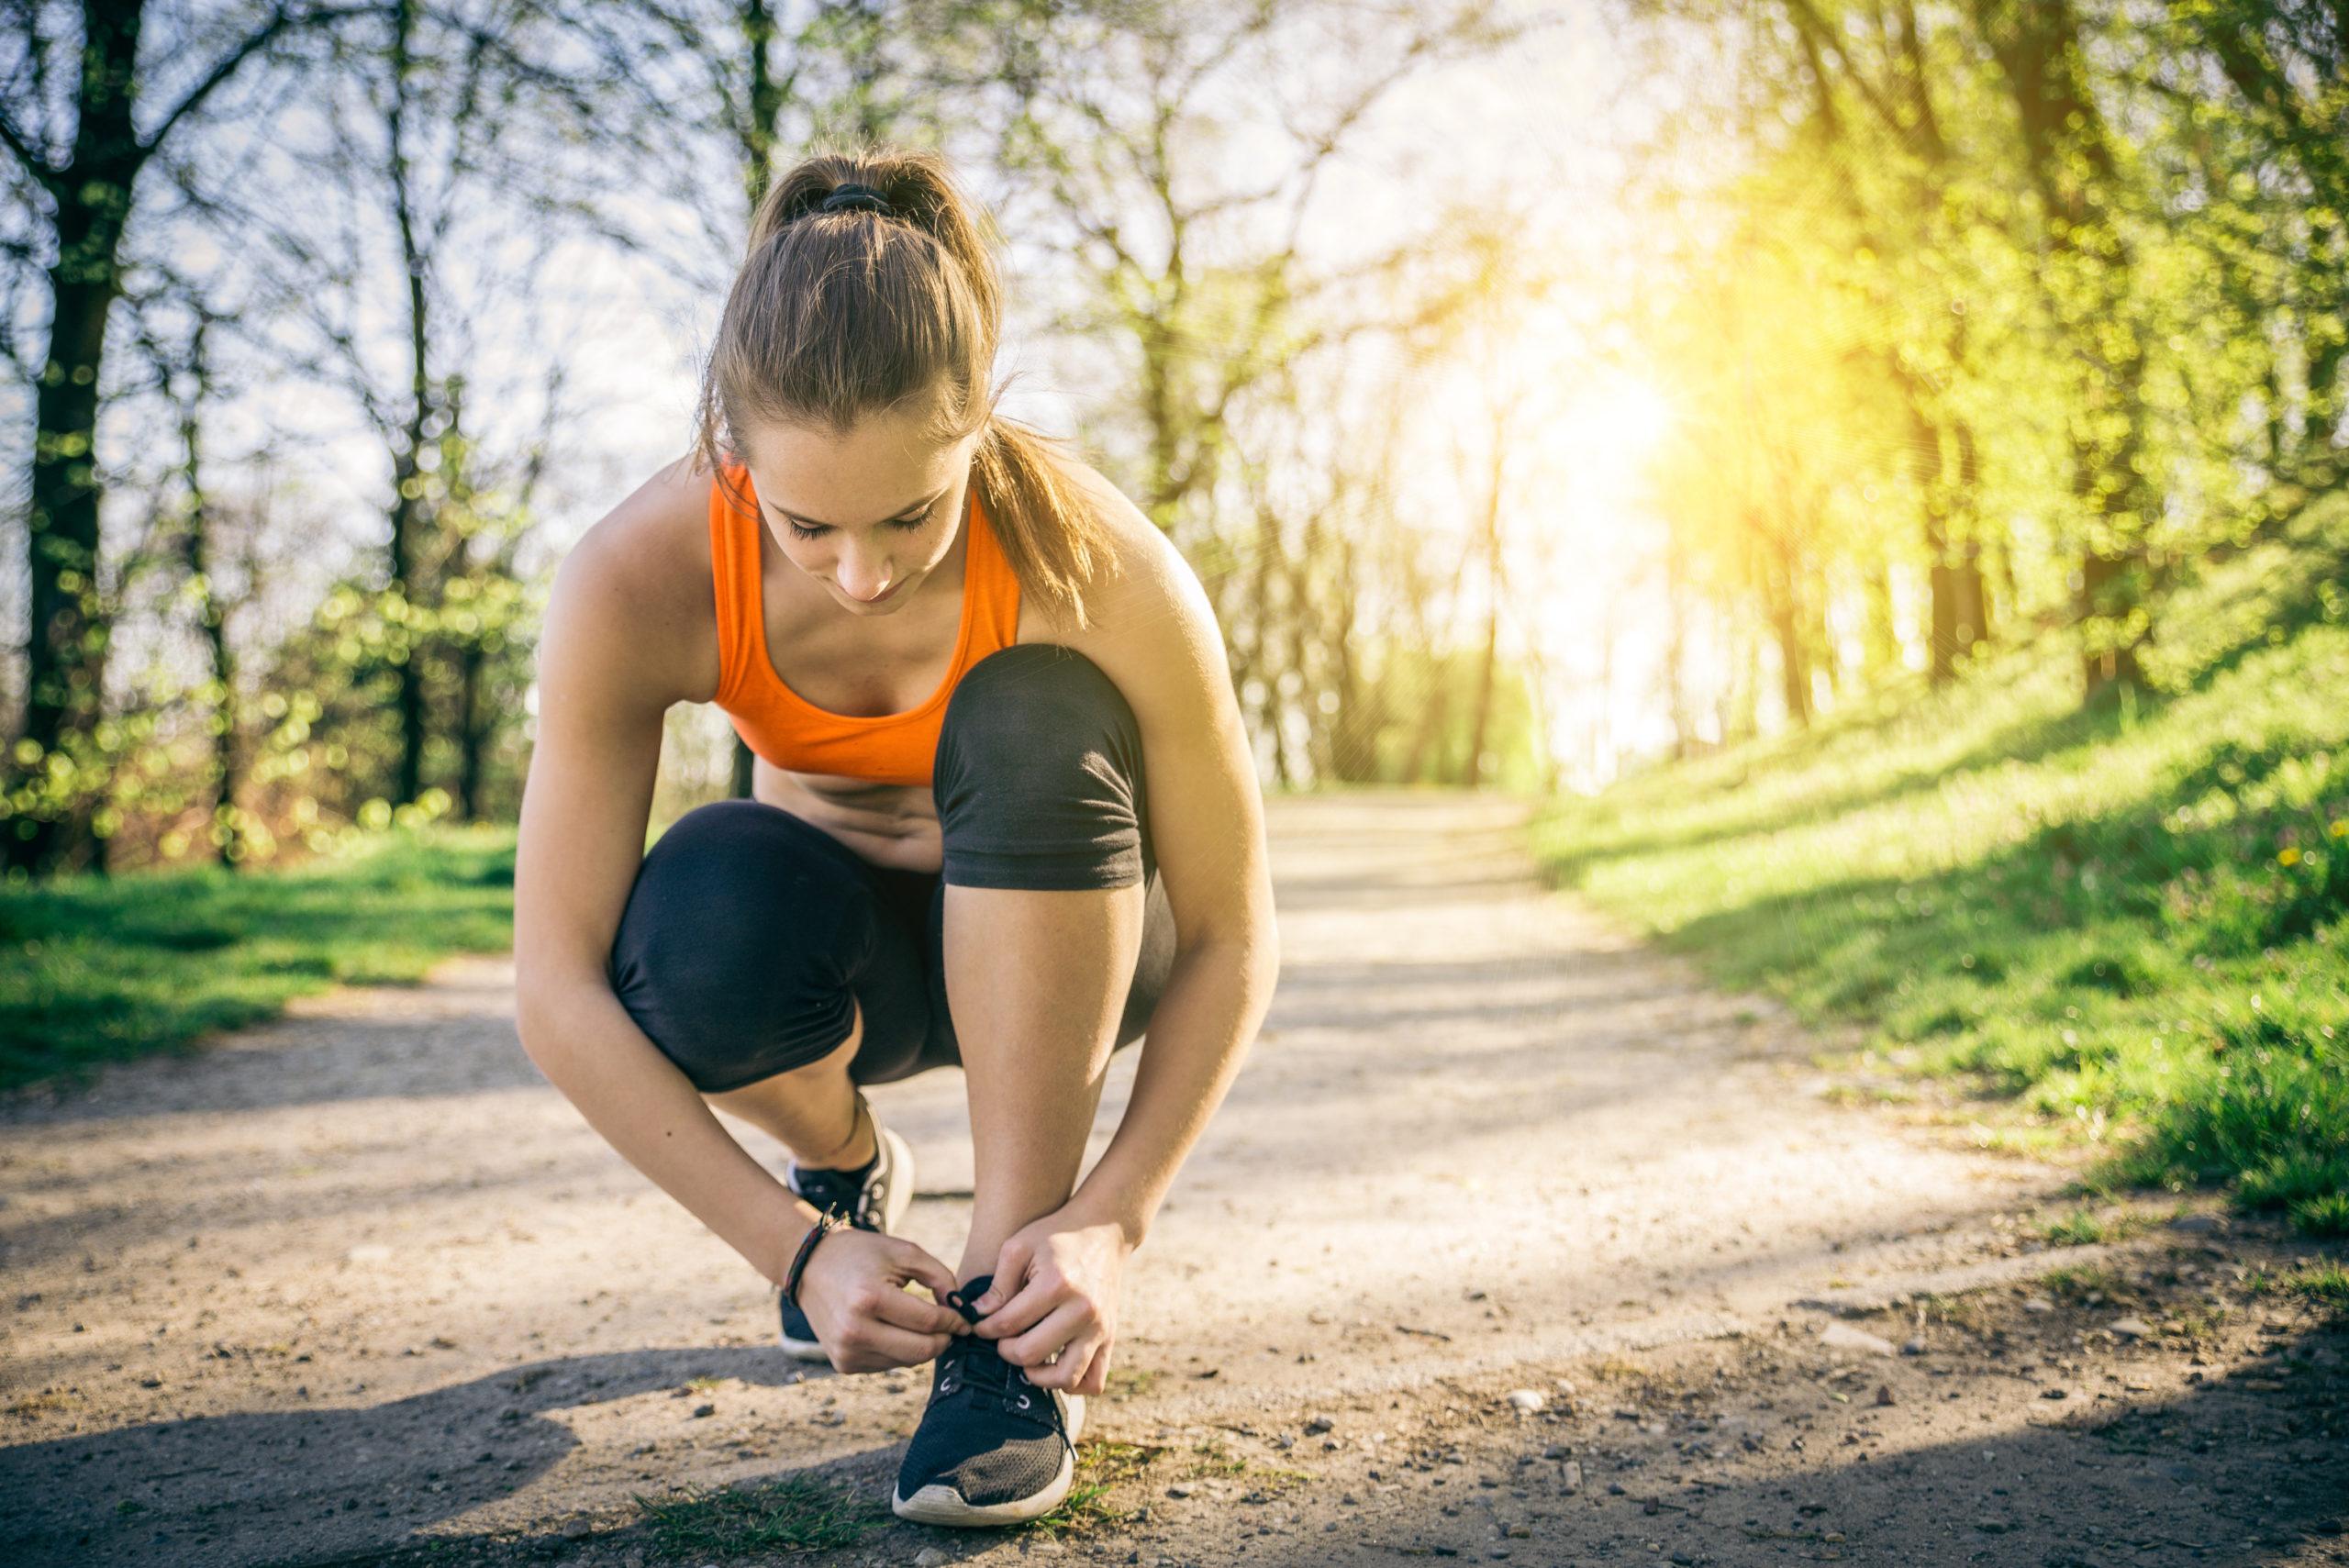 Female runner pausing to tie her shoe